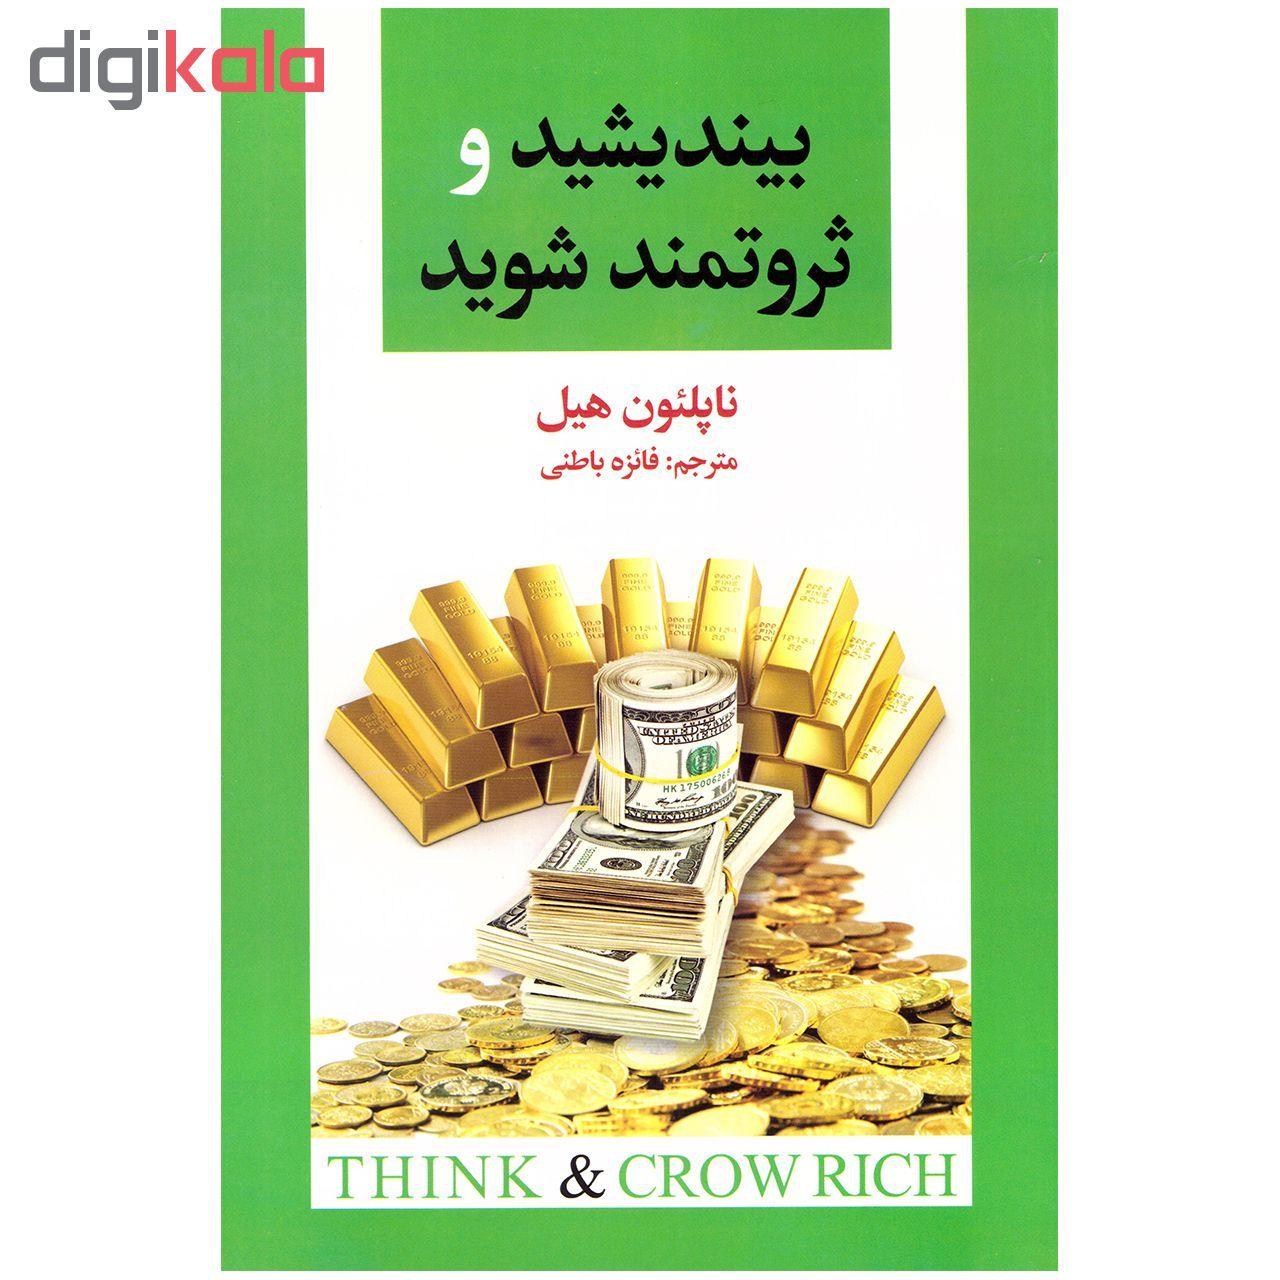 کتاب بیندیشید و ثروتمند شوید اثر ناپلئون هیل نشر ریواس main 1 1